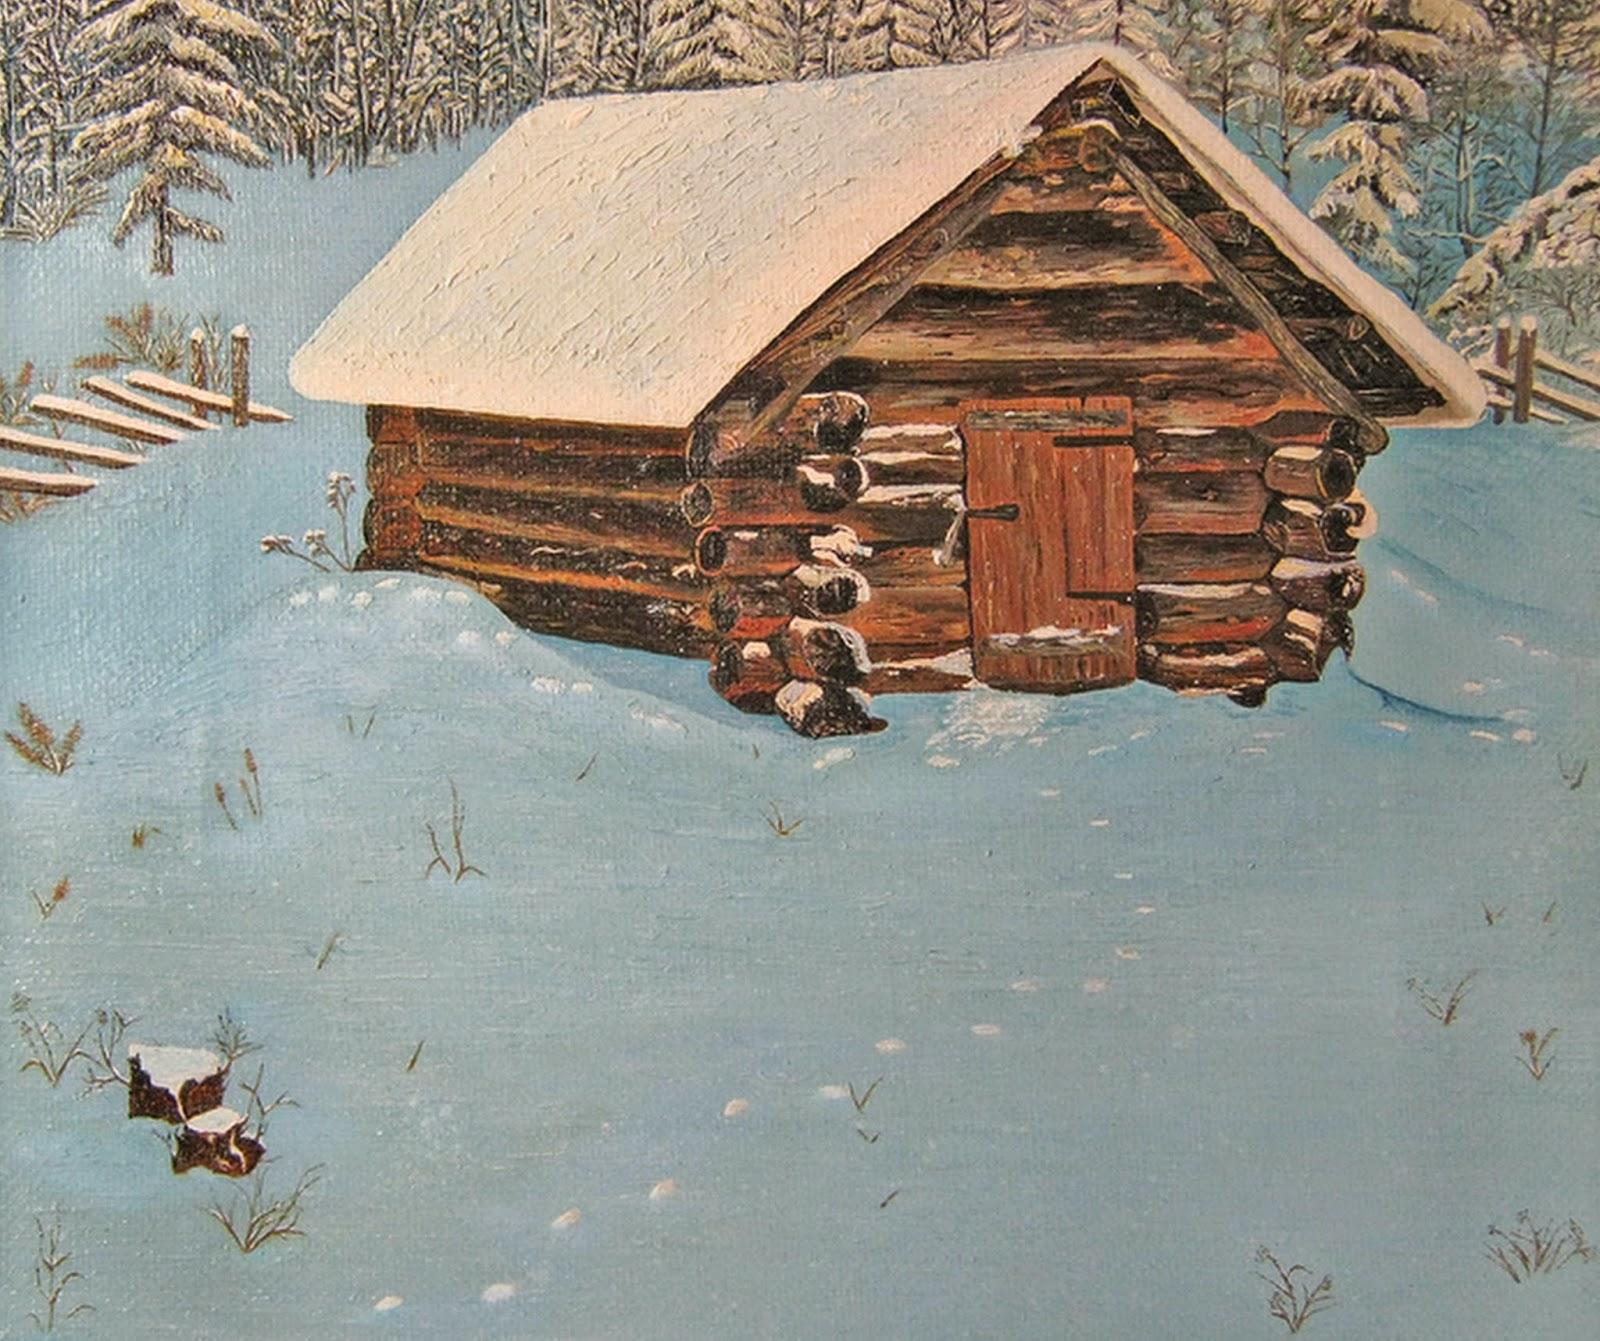 paisaje-natural-con-casa-de-madera